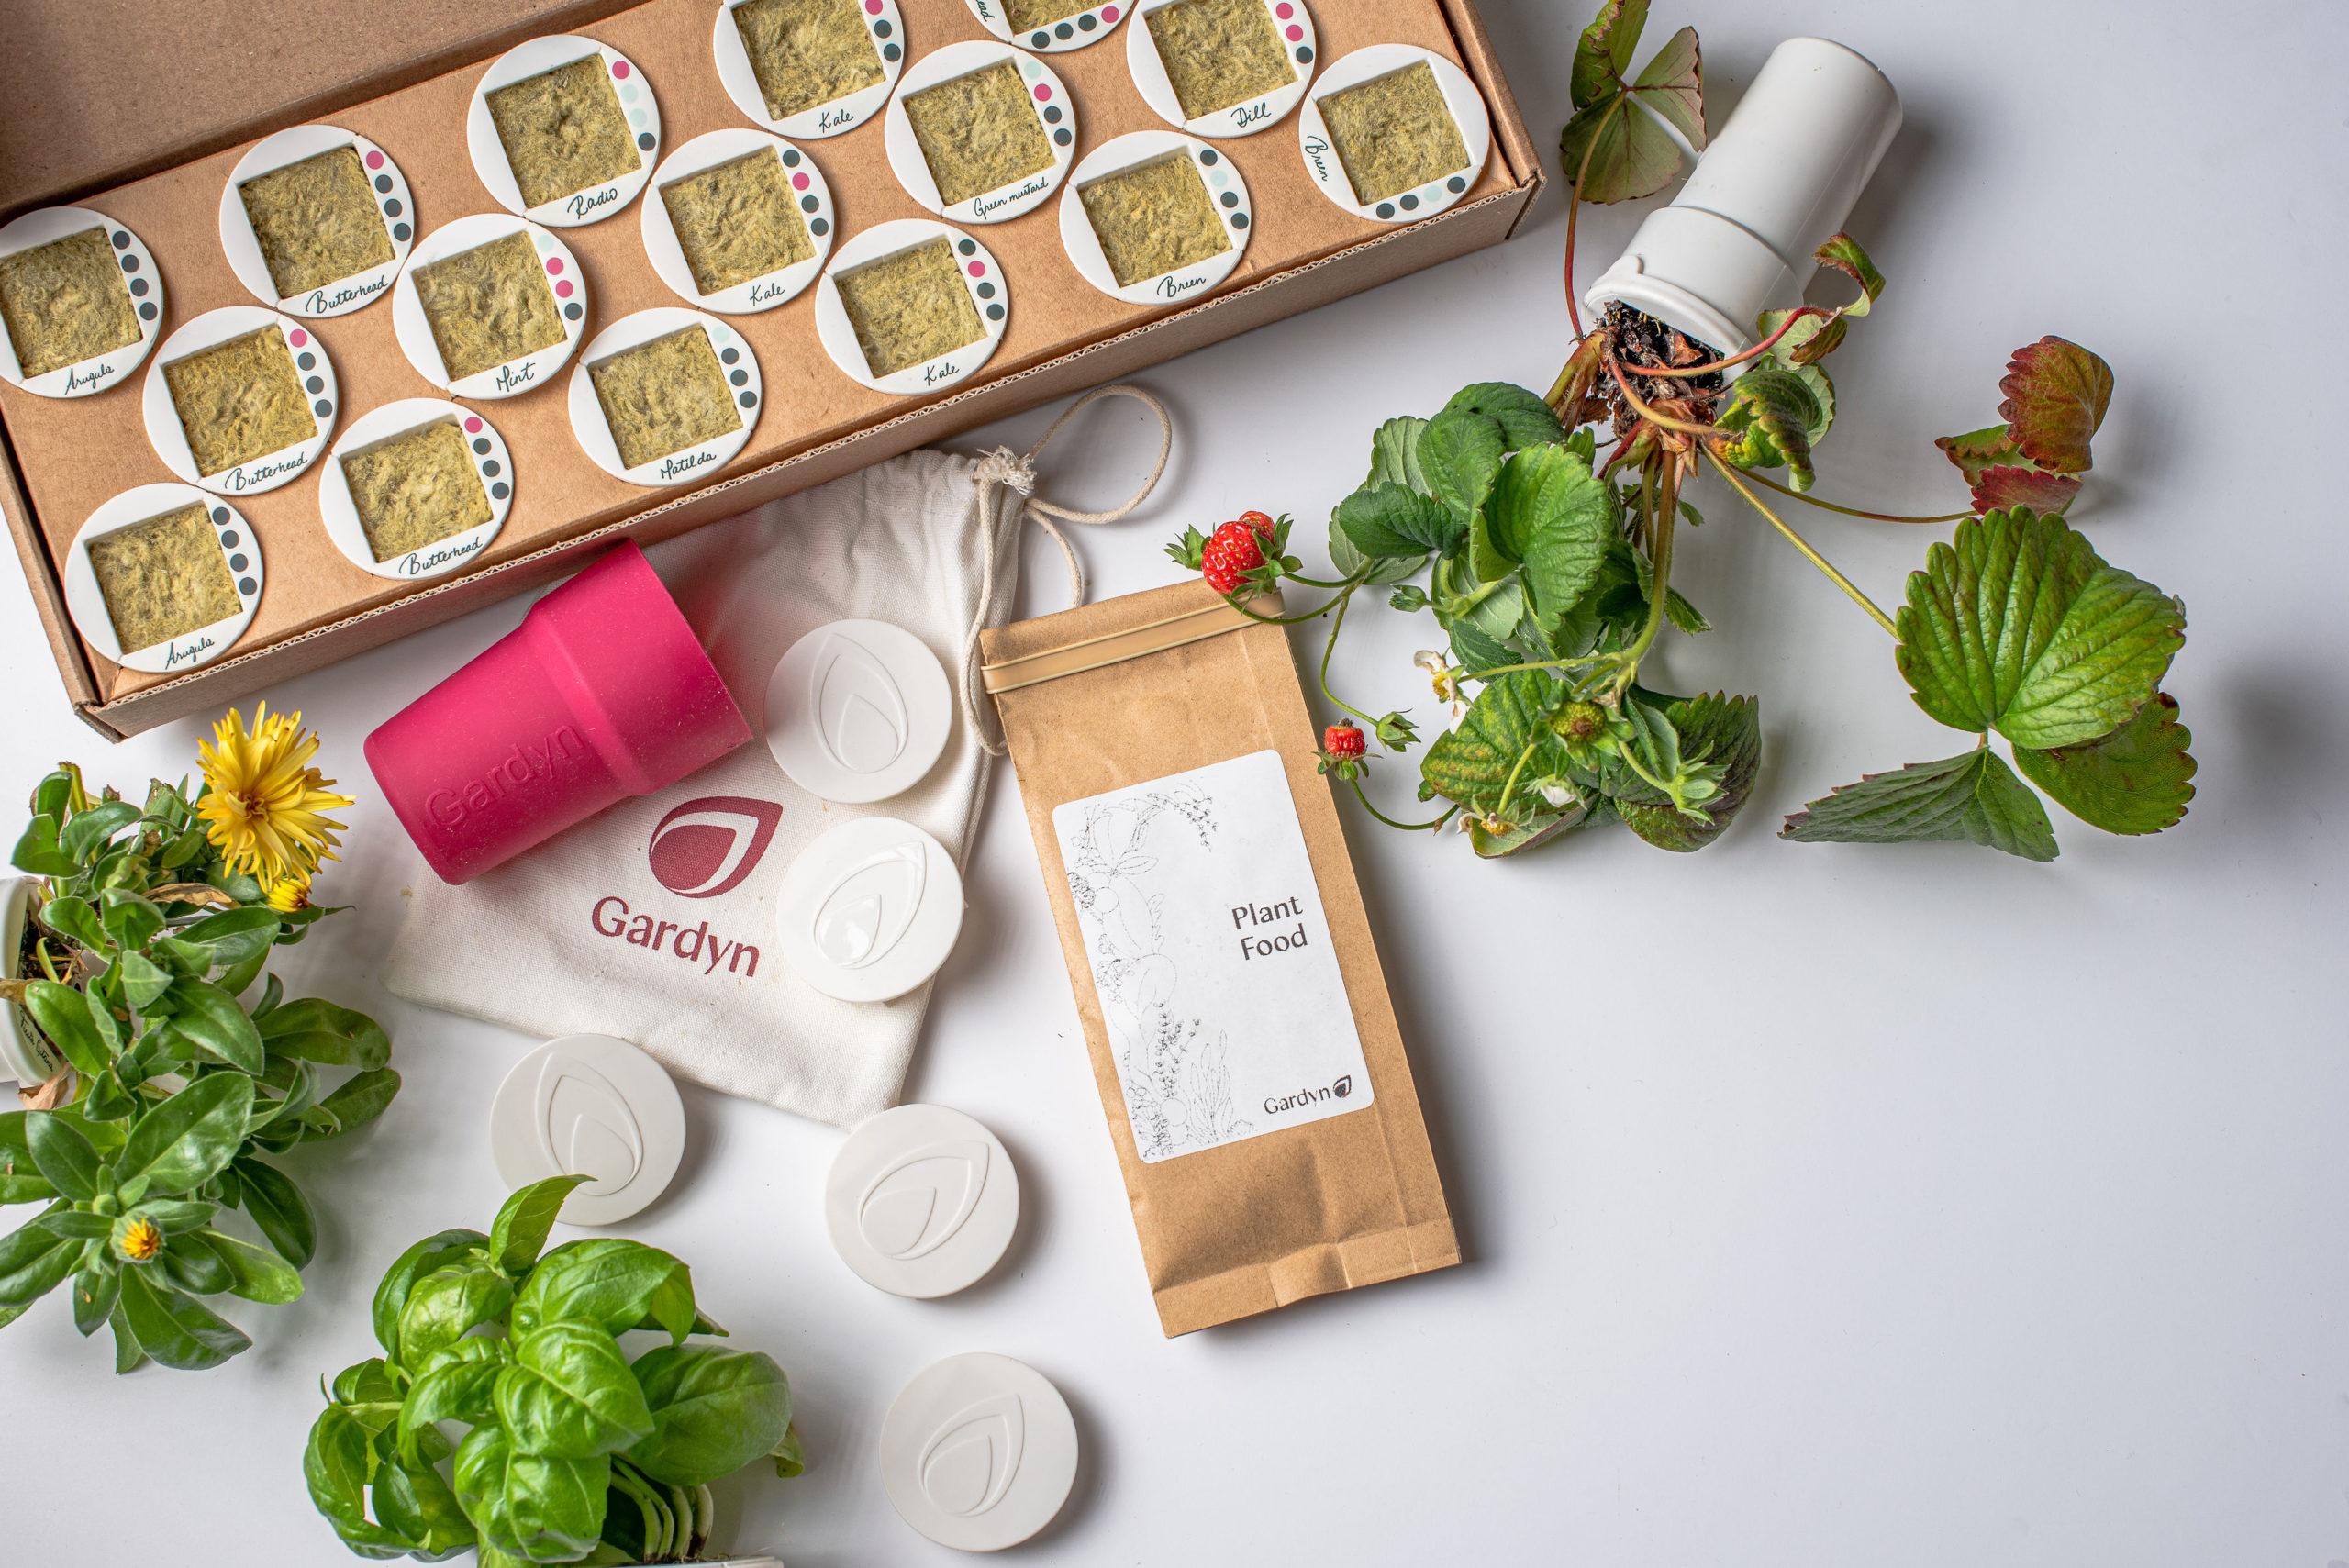 5 ways the Gardyn Starter Kit will rock your tastebuds and boost brain function